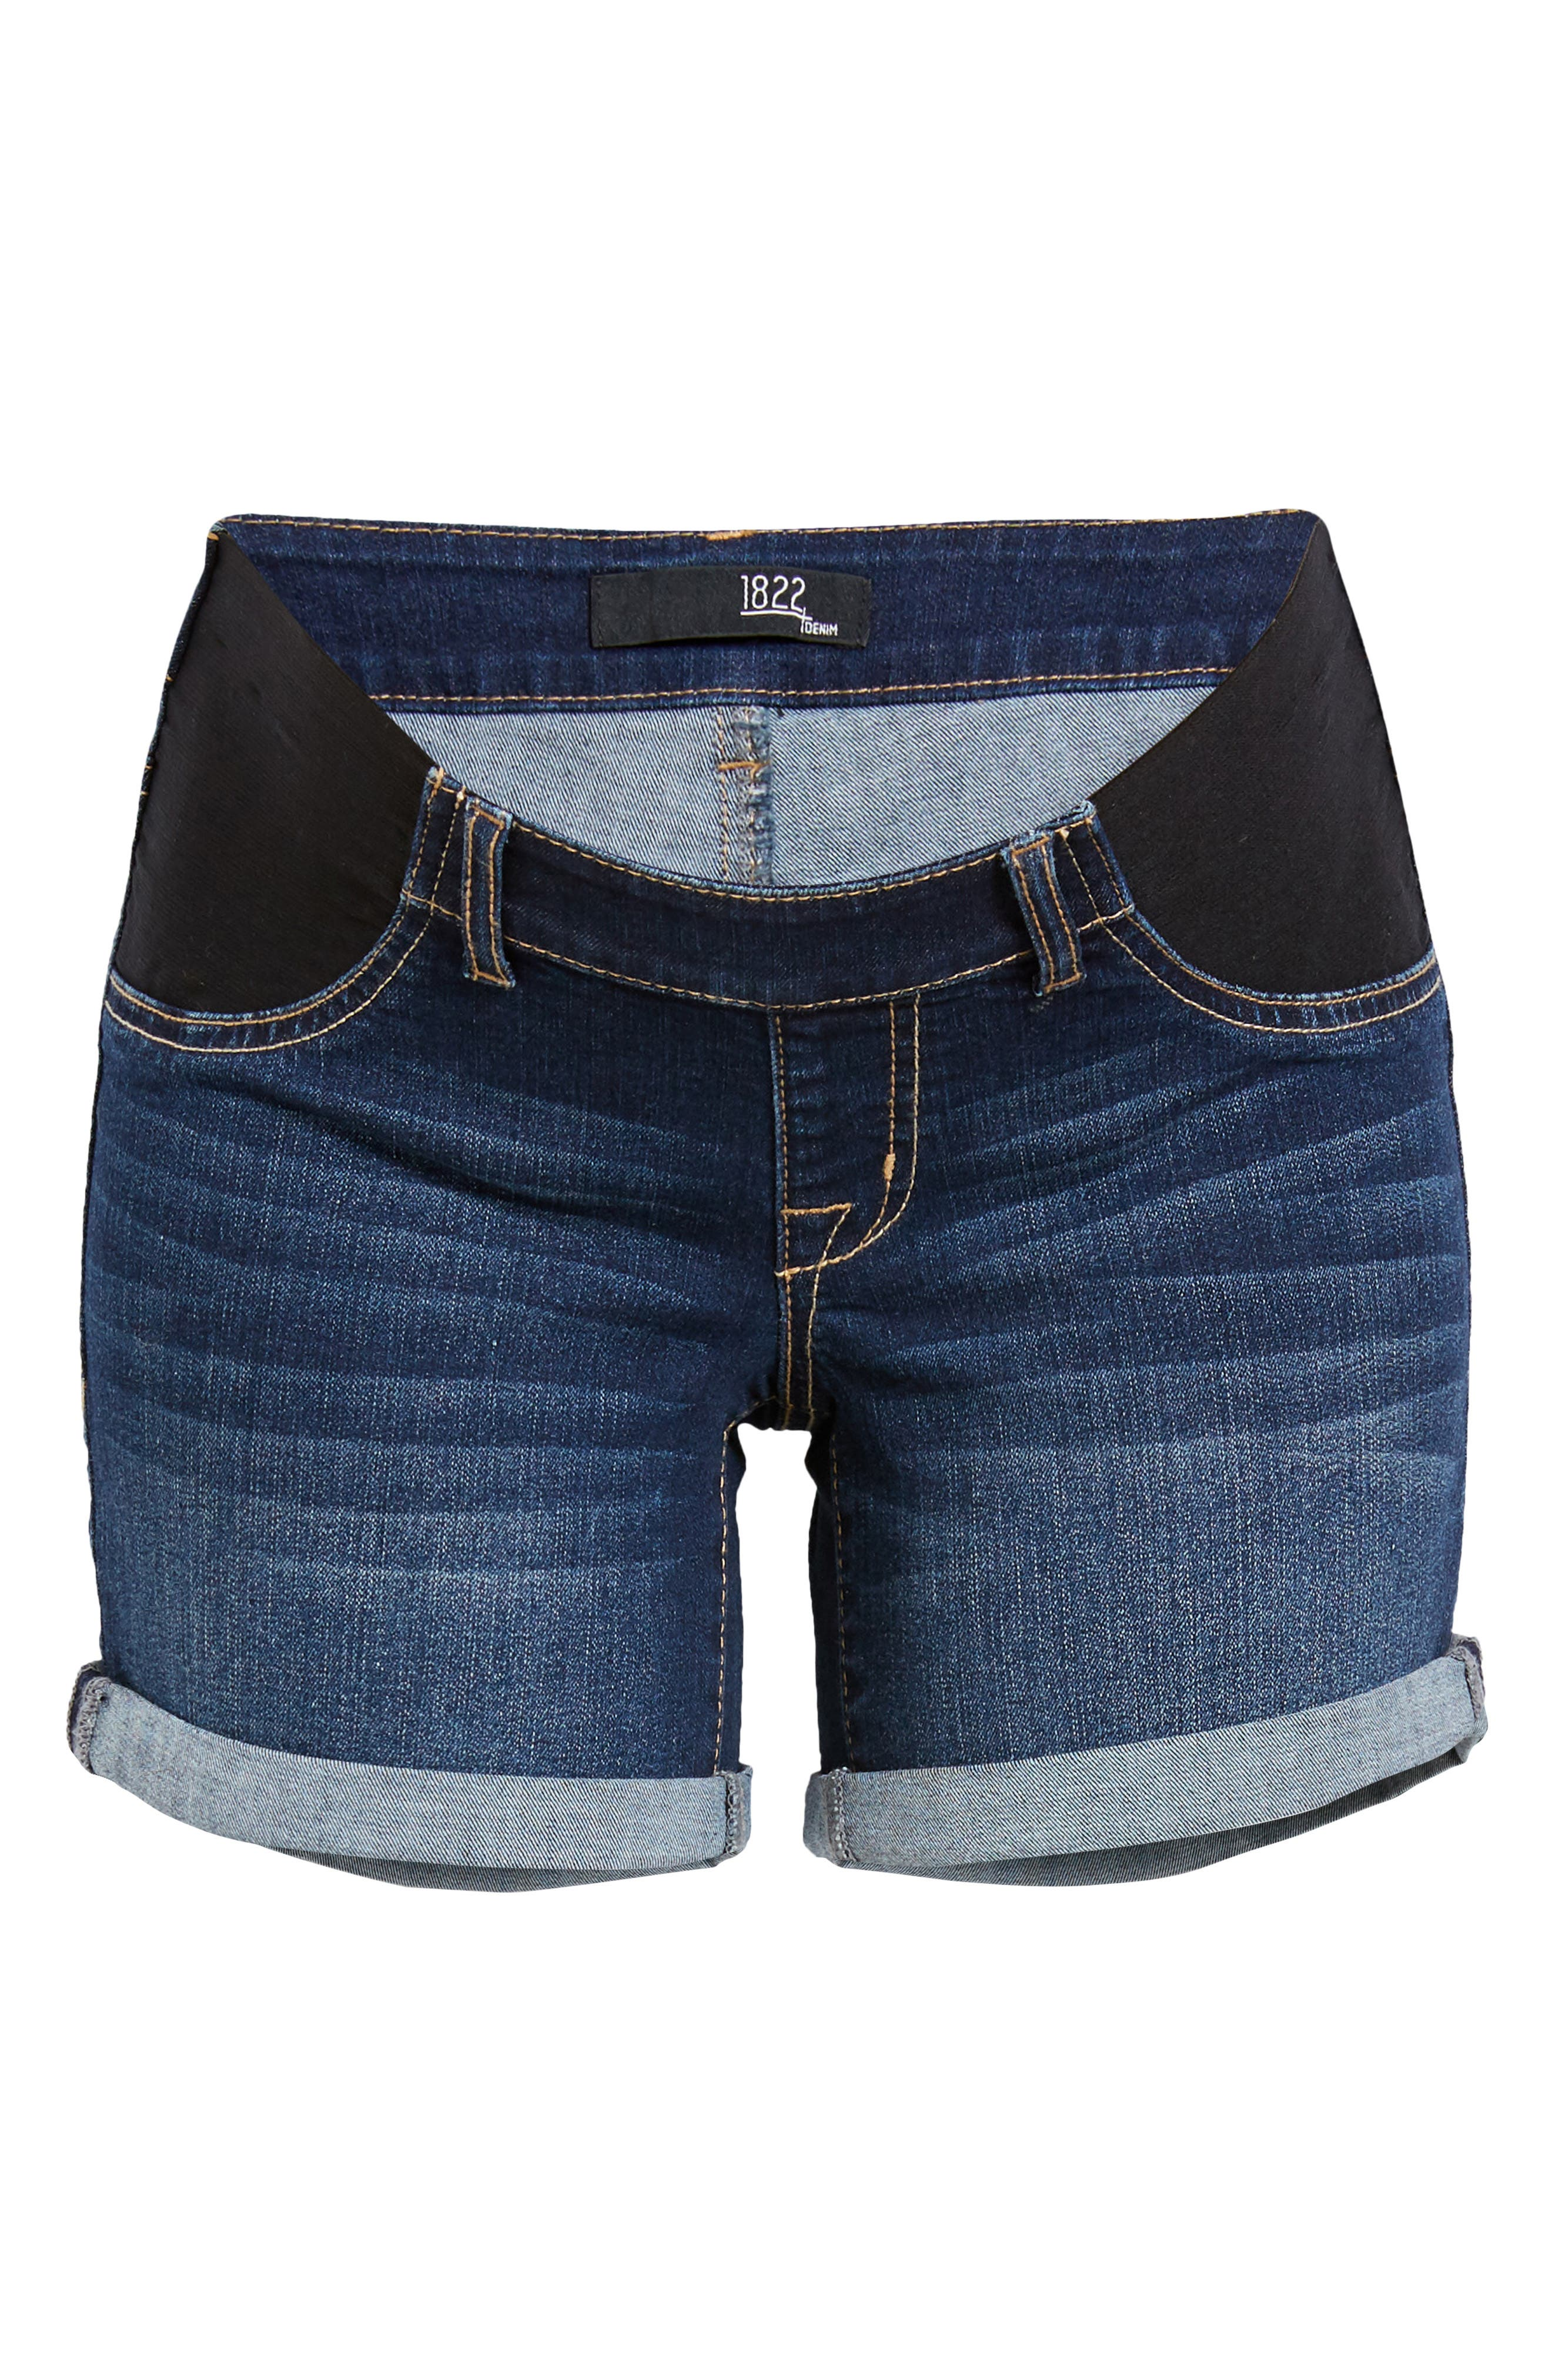 Women's 1822 Denim Re: denim Maternity Shorts